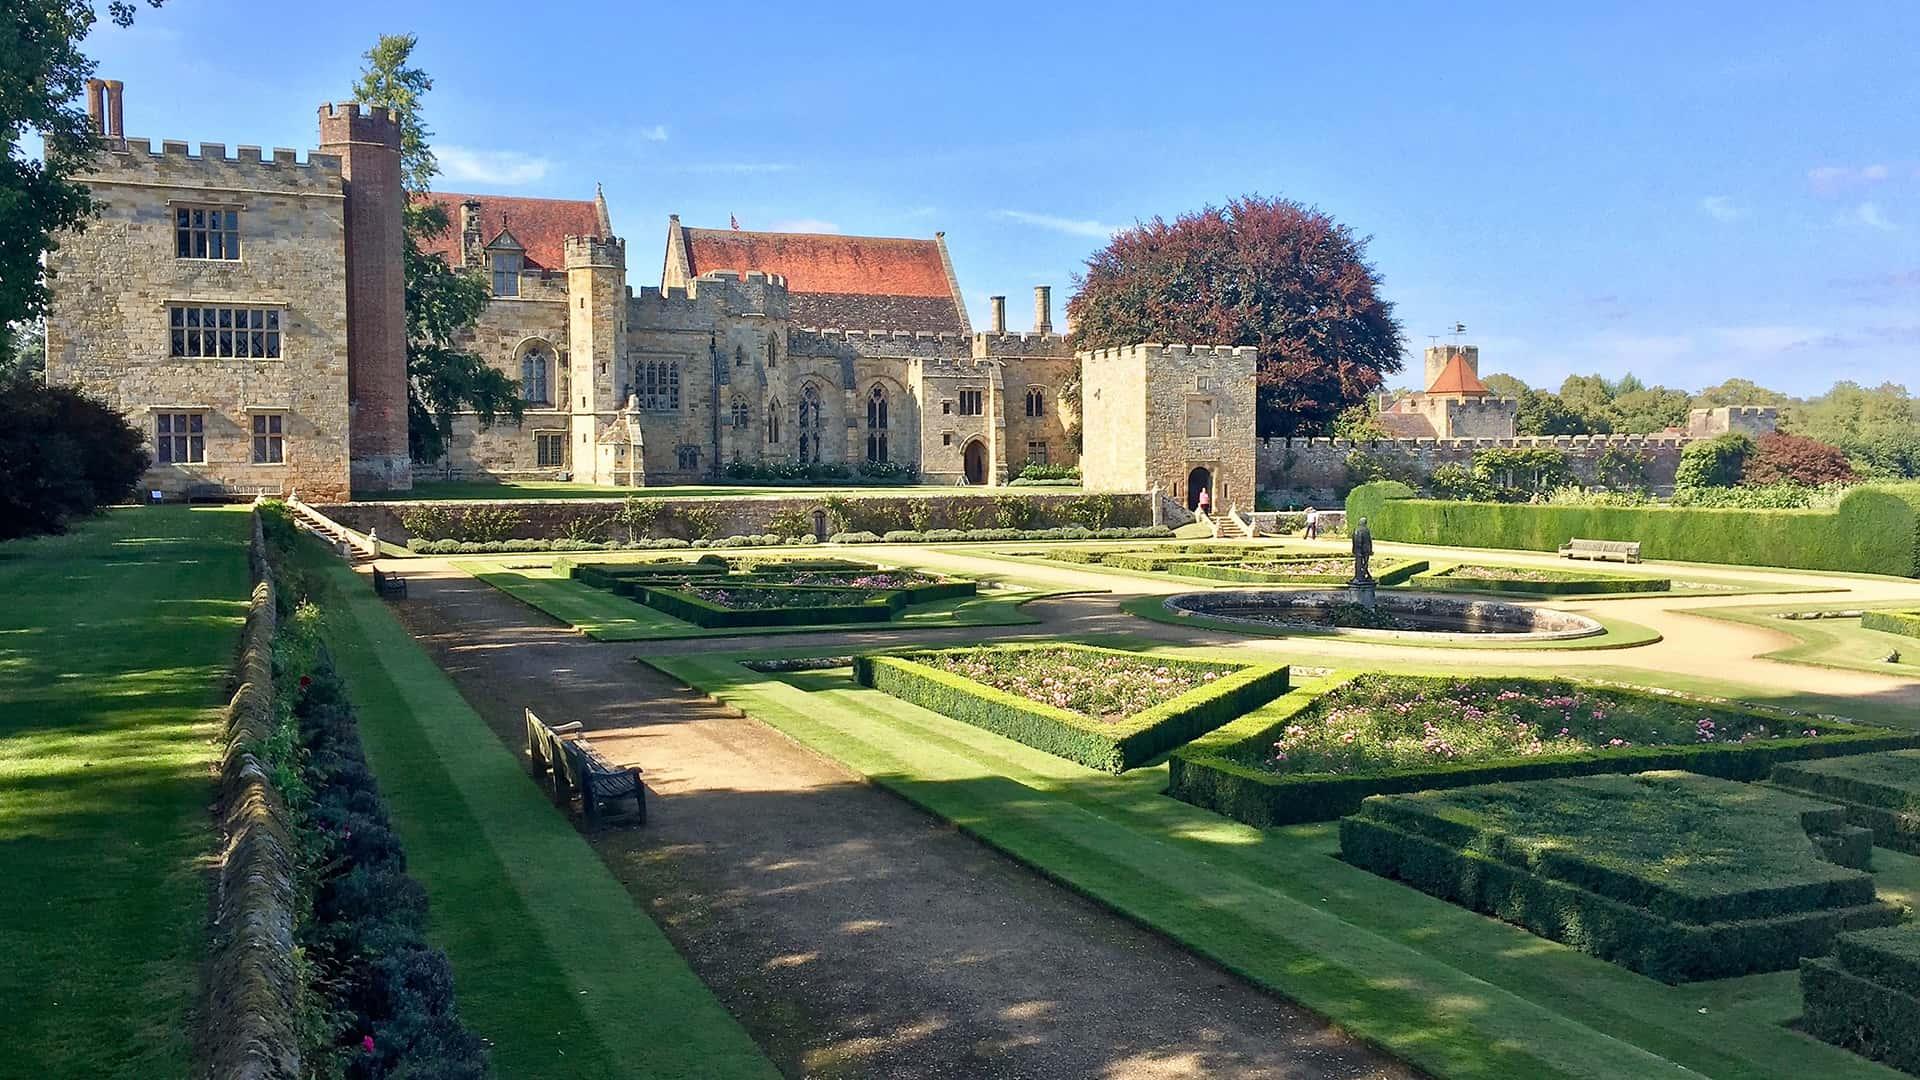 Stunning Gardens at Penshurst Place